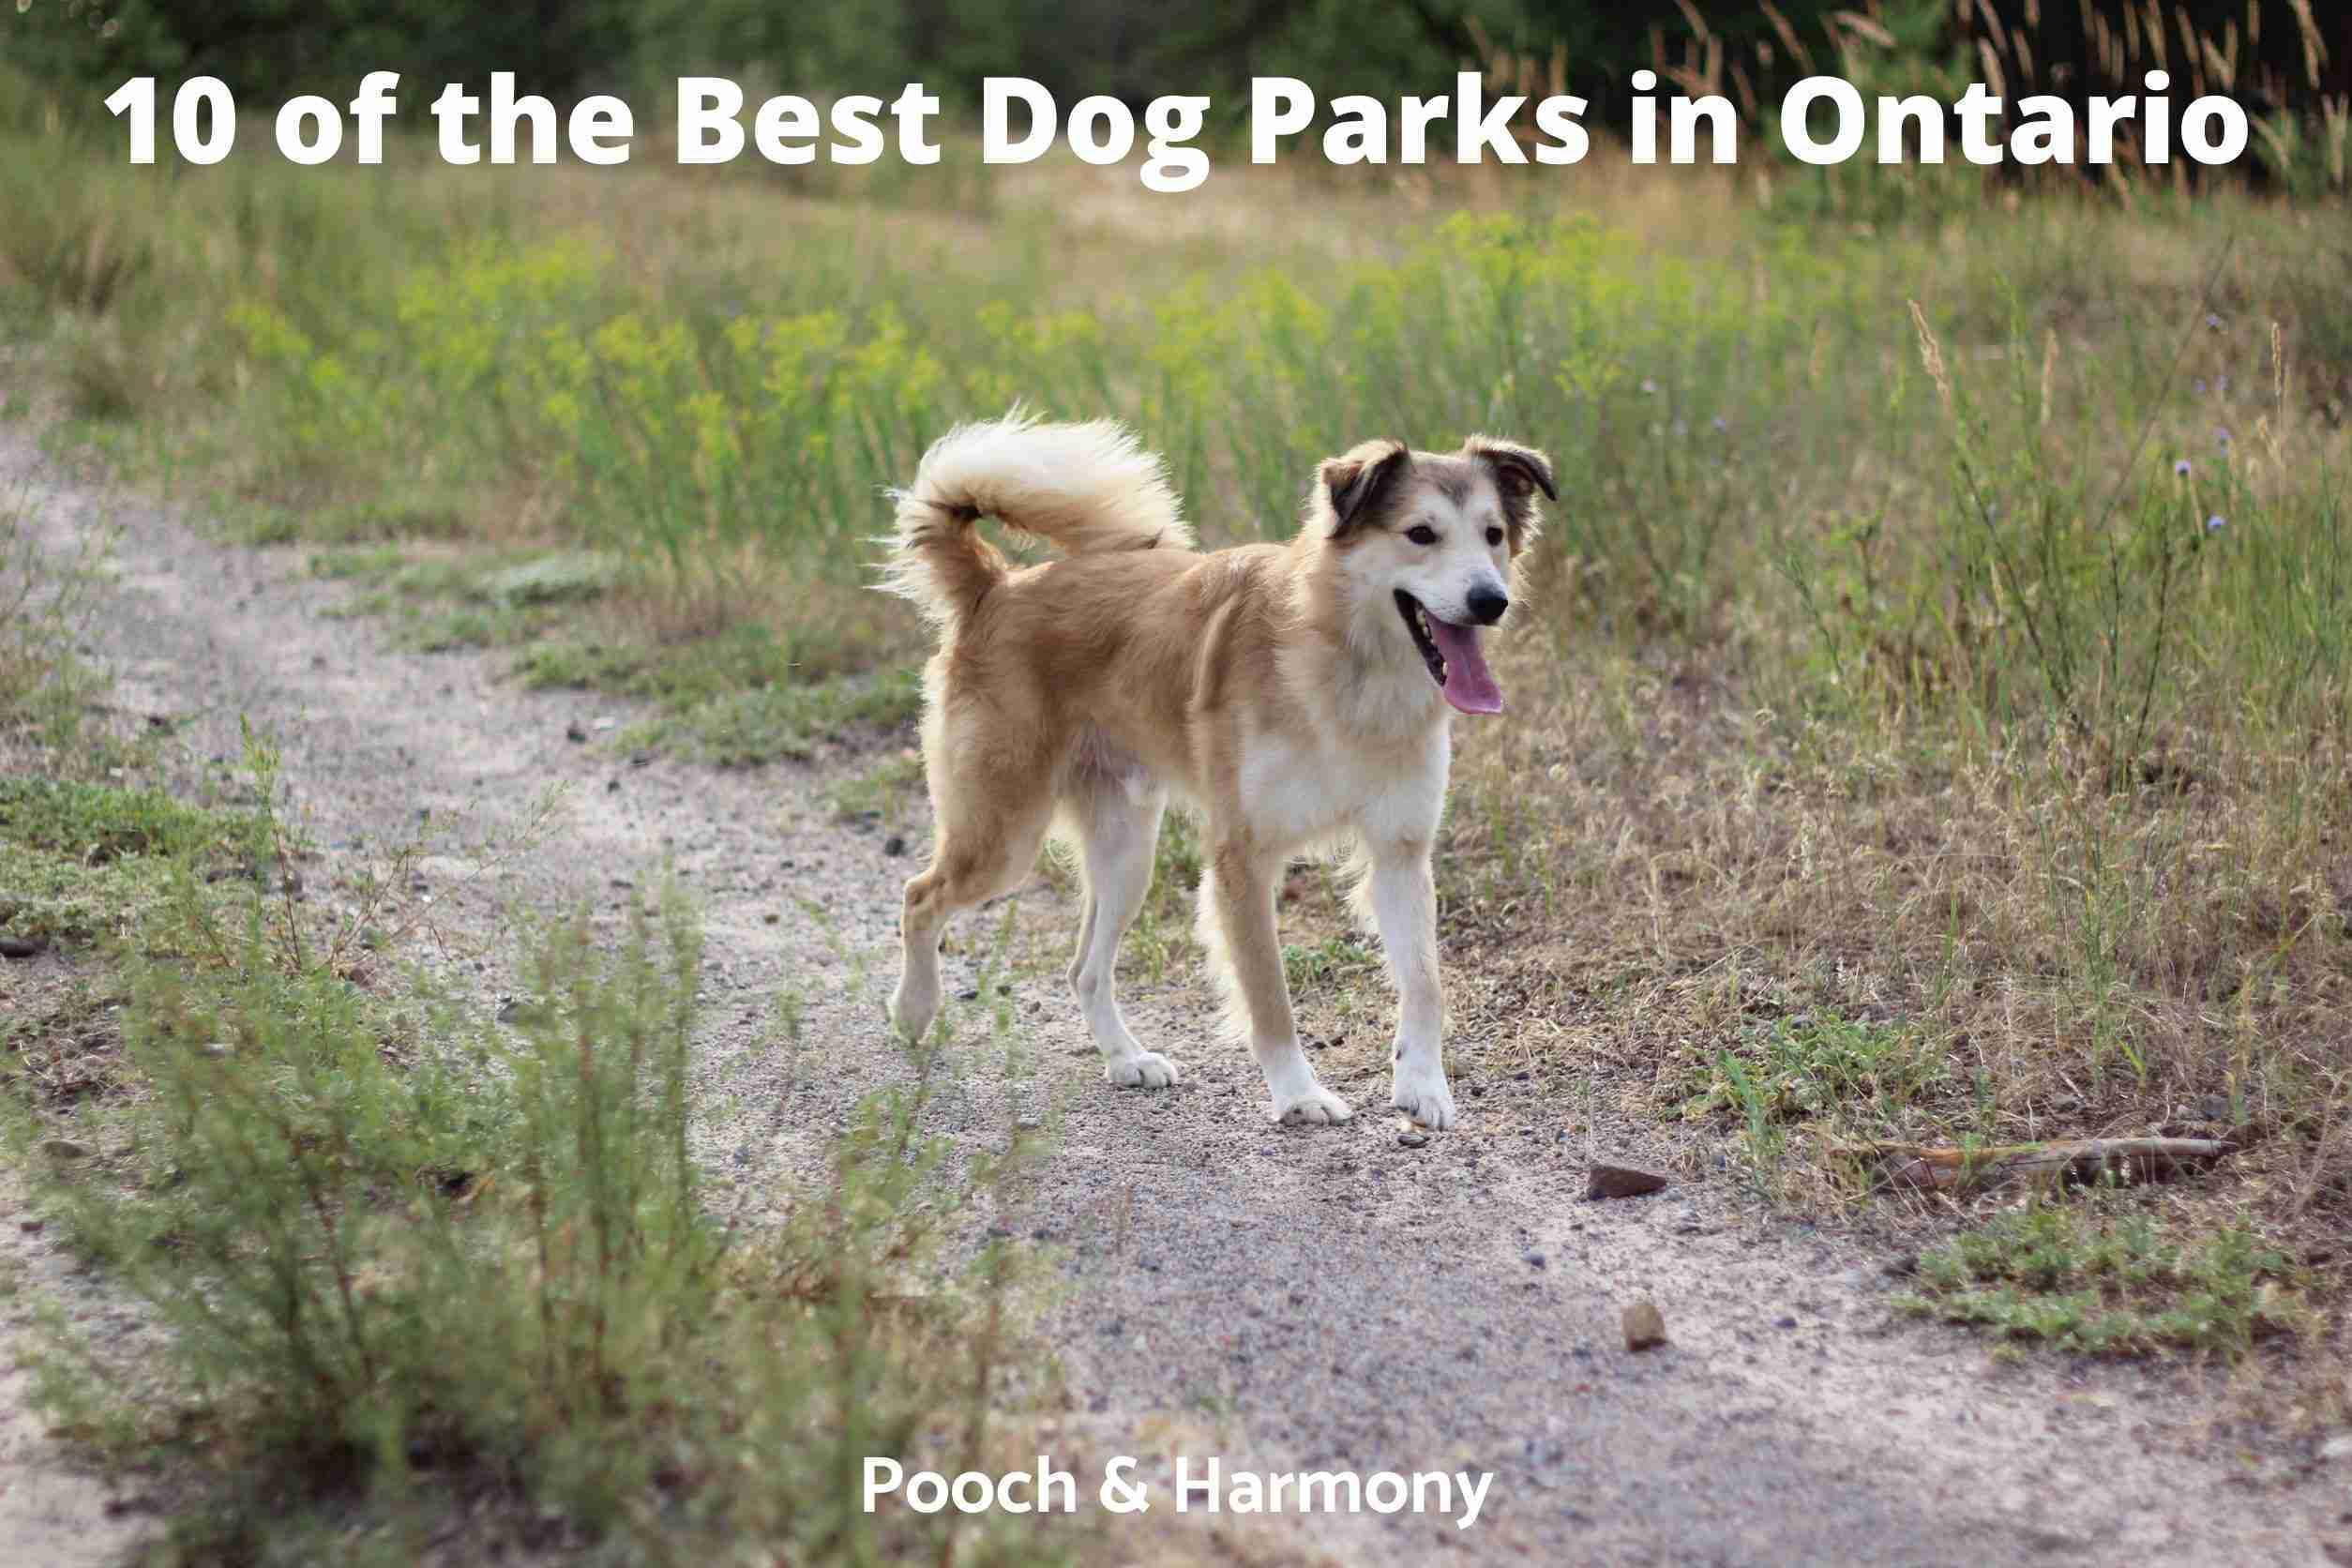 Best Dog Parks in Ontario